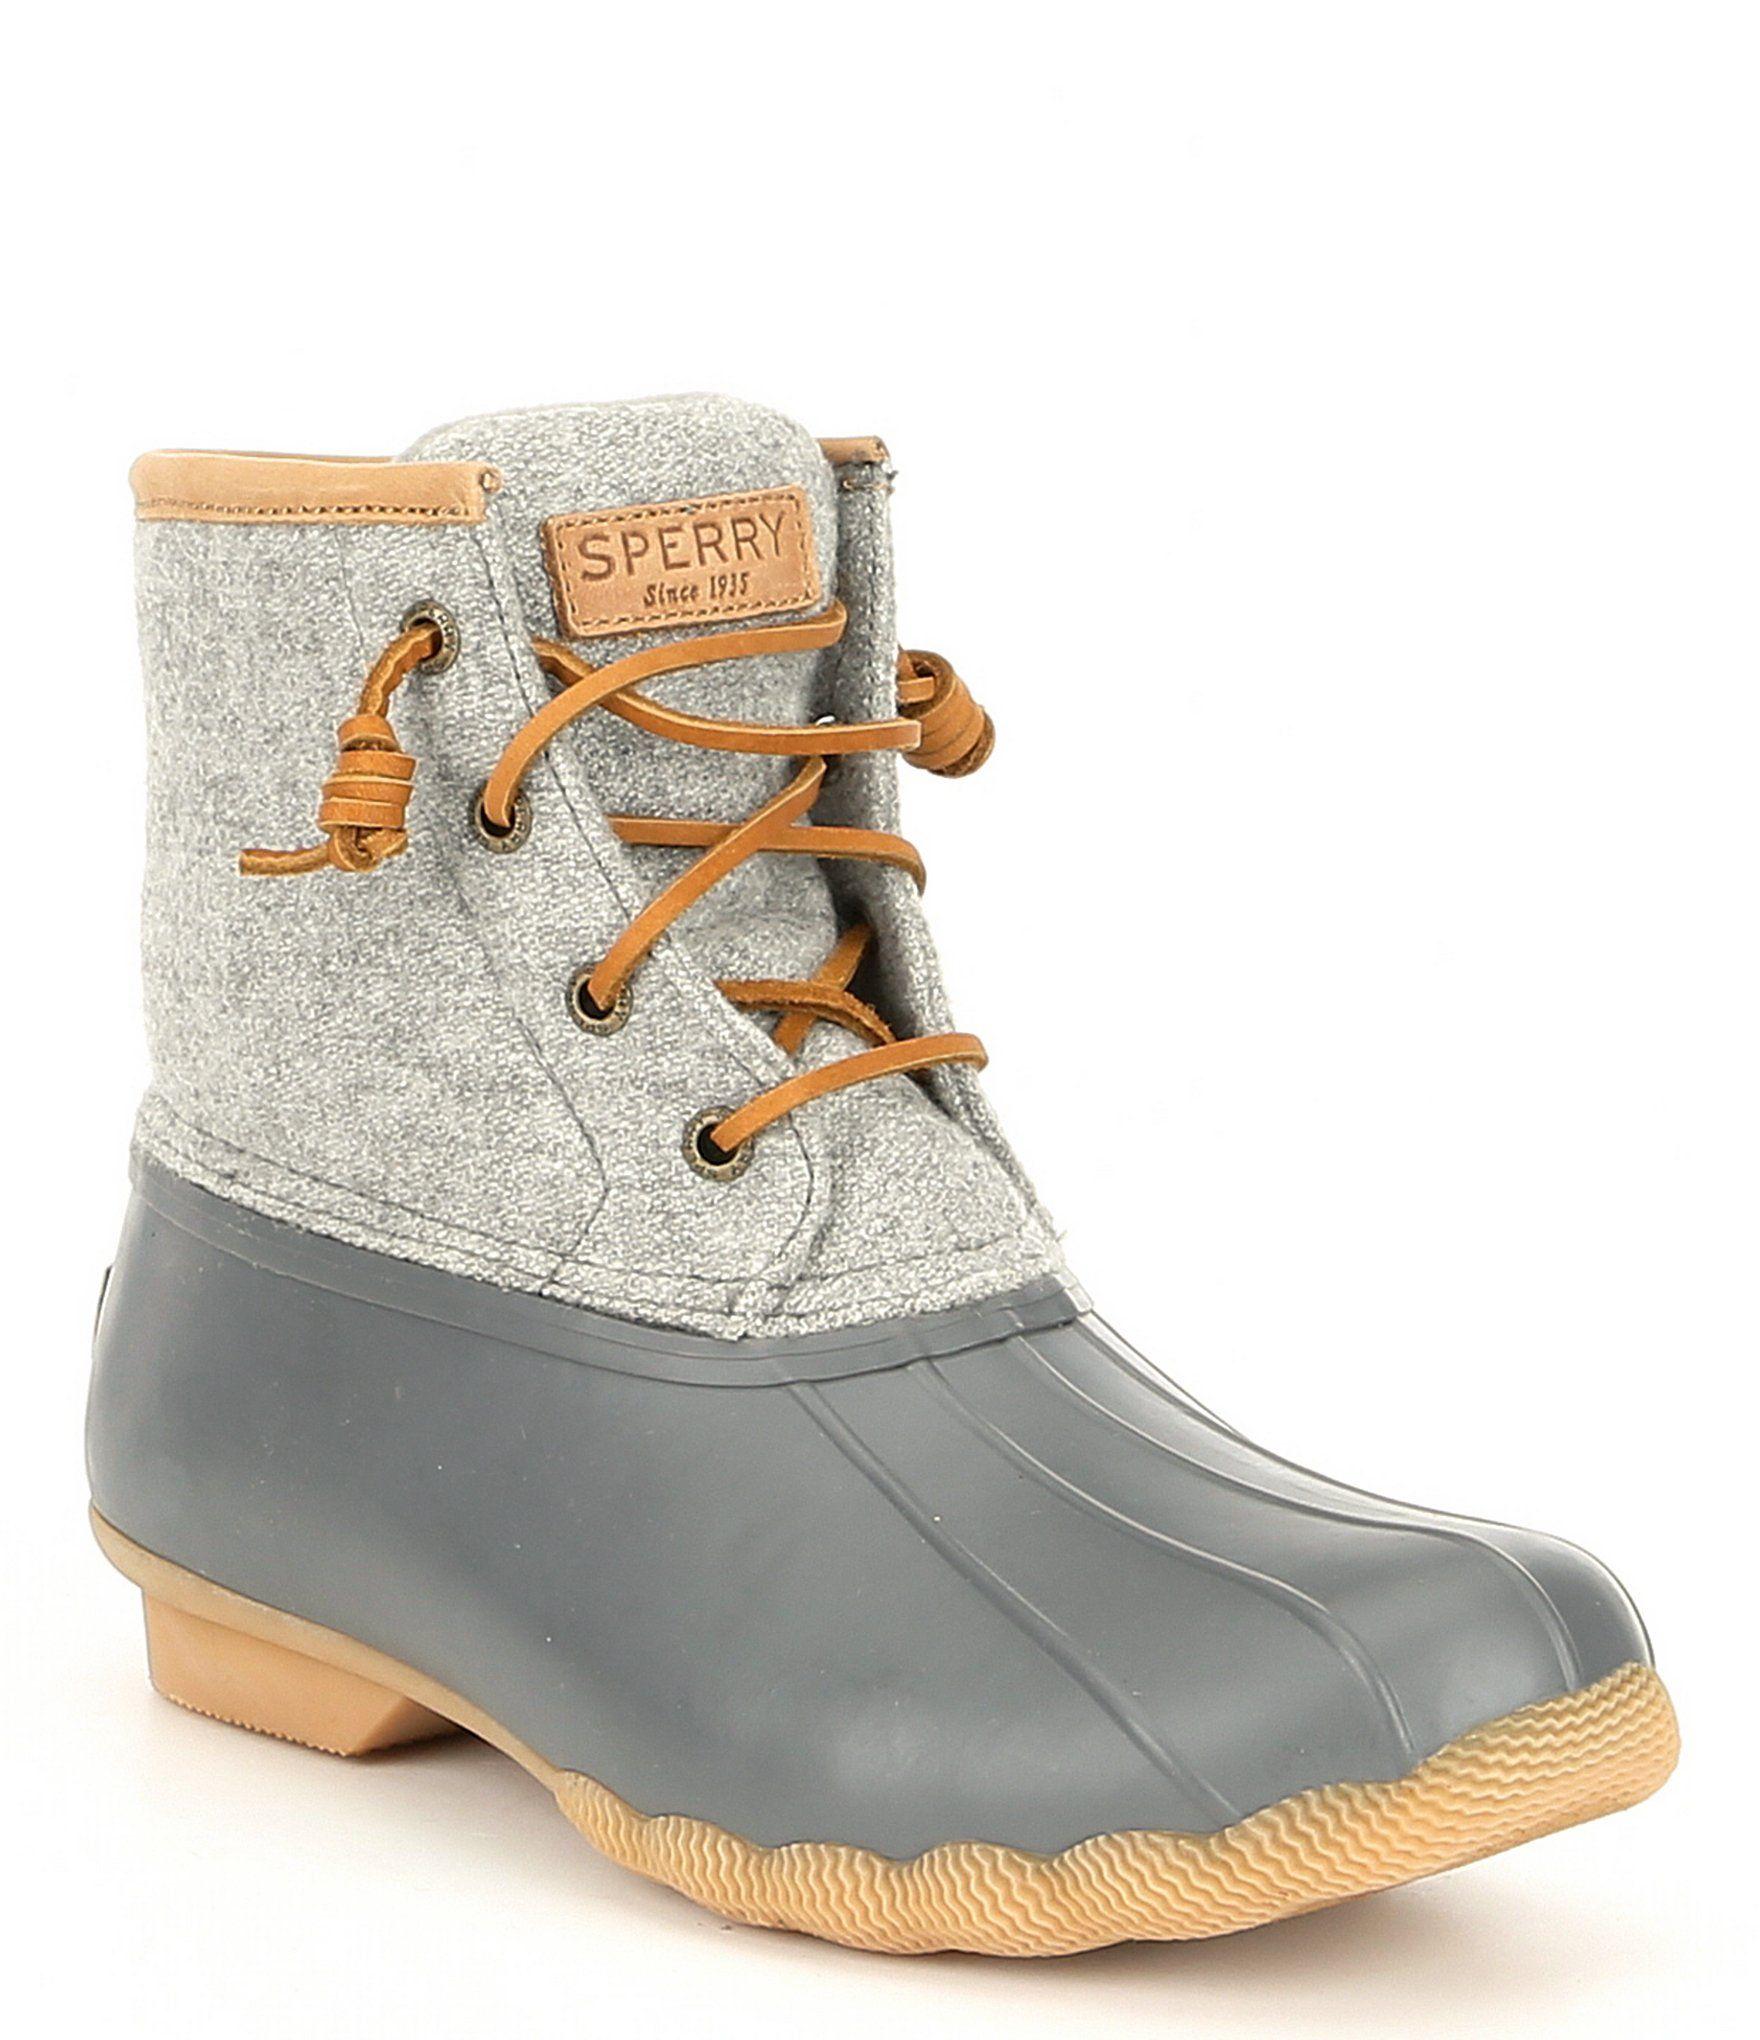 Sperry Saltwater Emboss Wool Duck Rain Boots Dillards Cute Winter Boots Sperry Duck Boots Outfit Boots